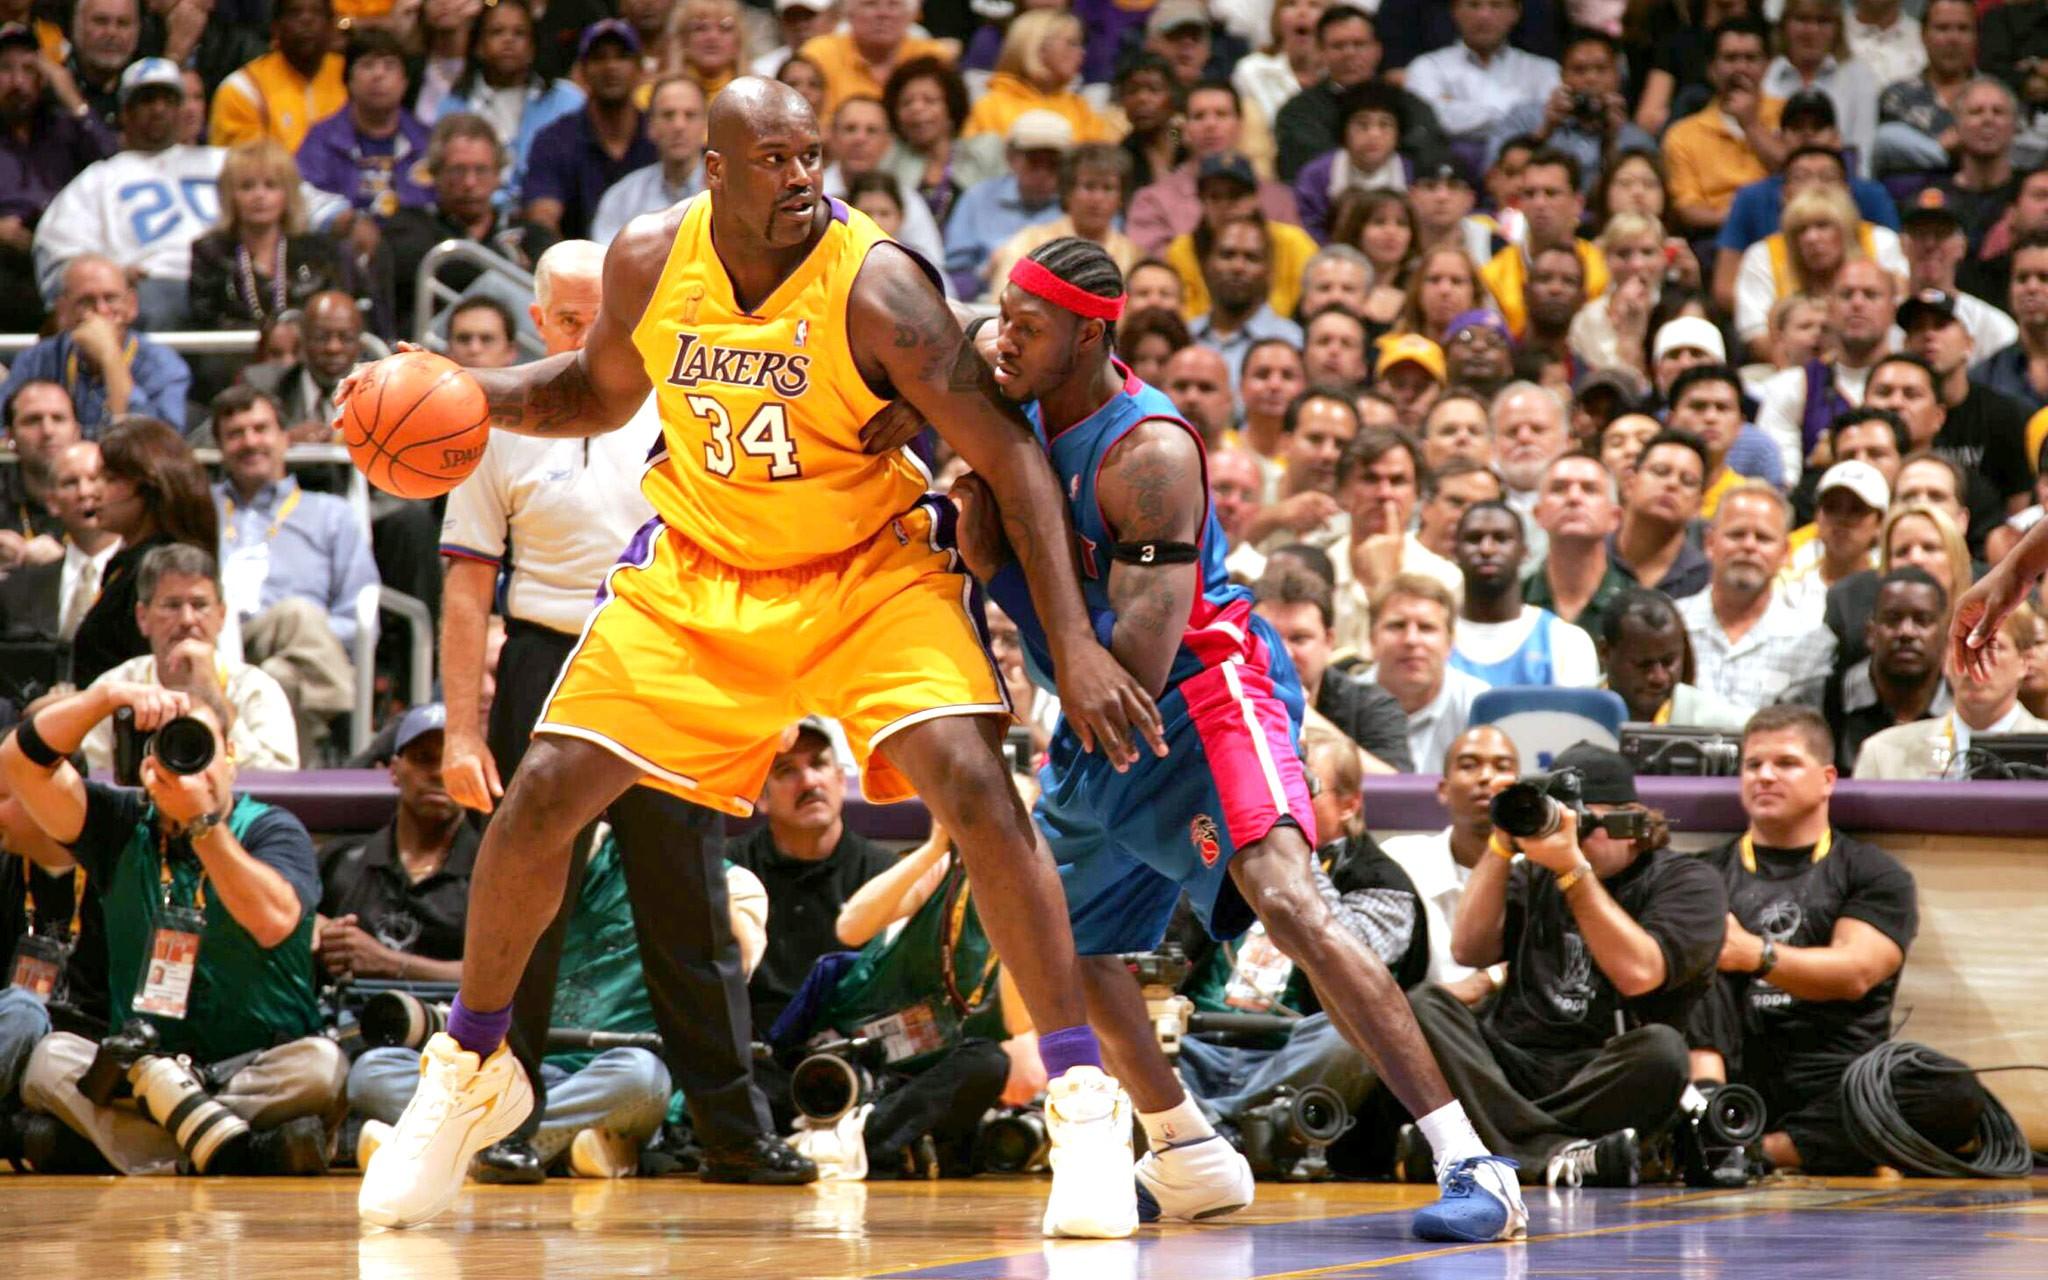 Nba Basketball Los Angeles Lakers: Wallpaper : Sports, Los Angeles, NBA, Los Angeles Lakers